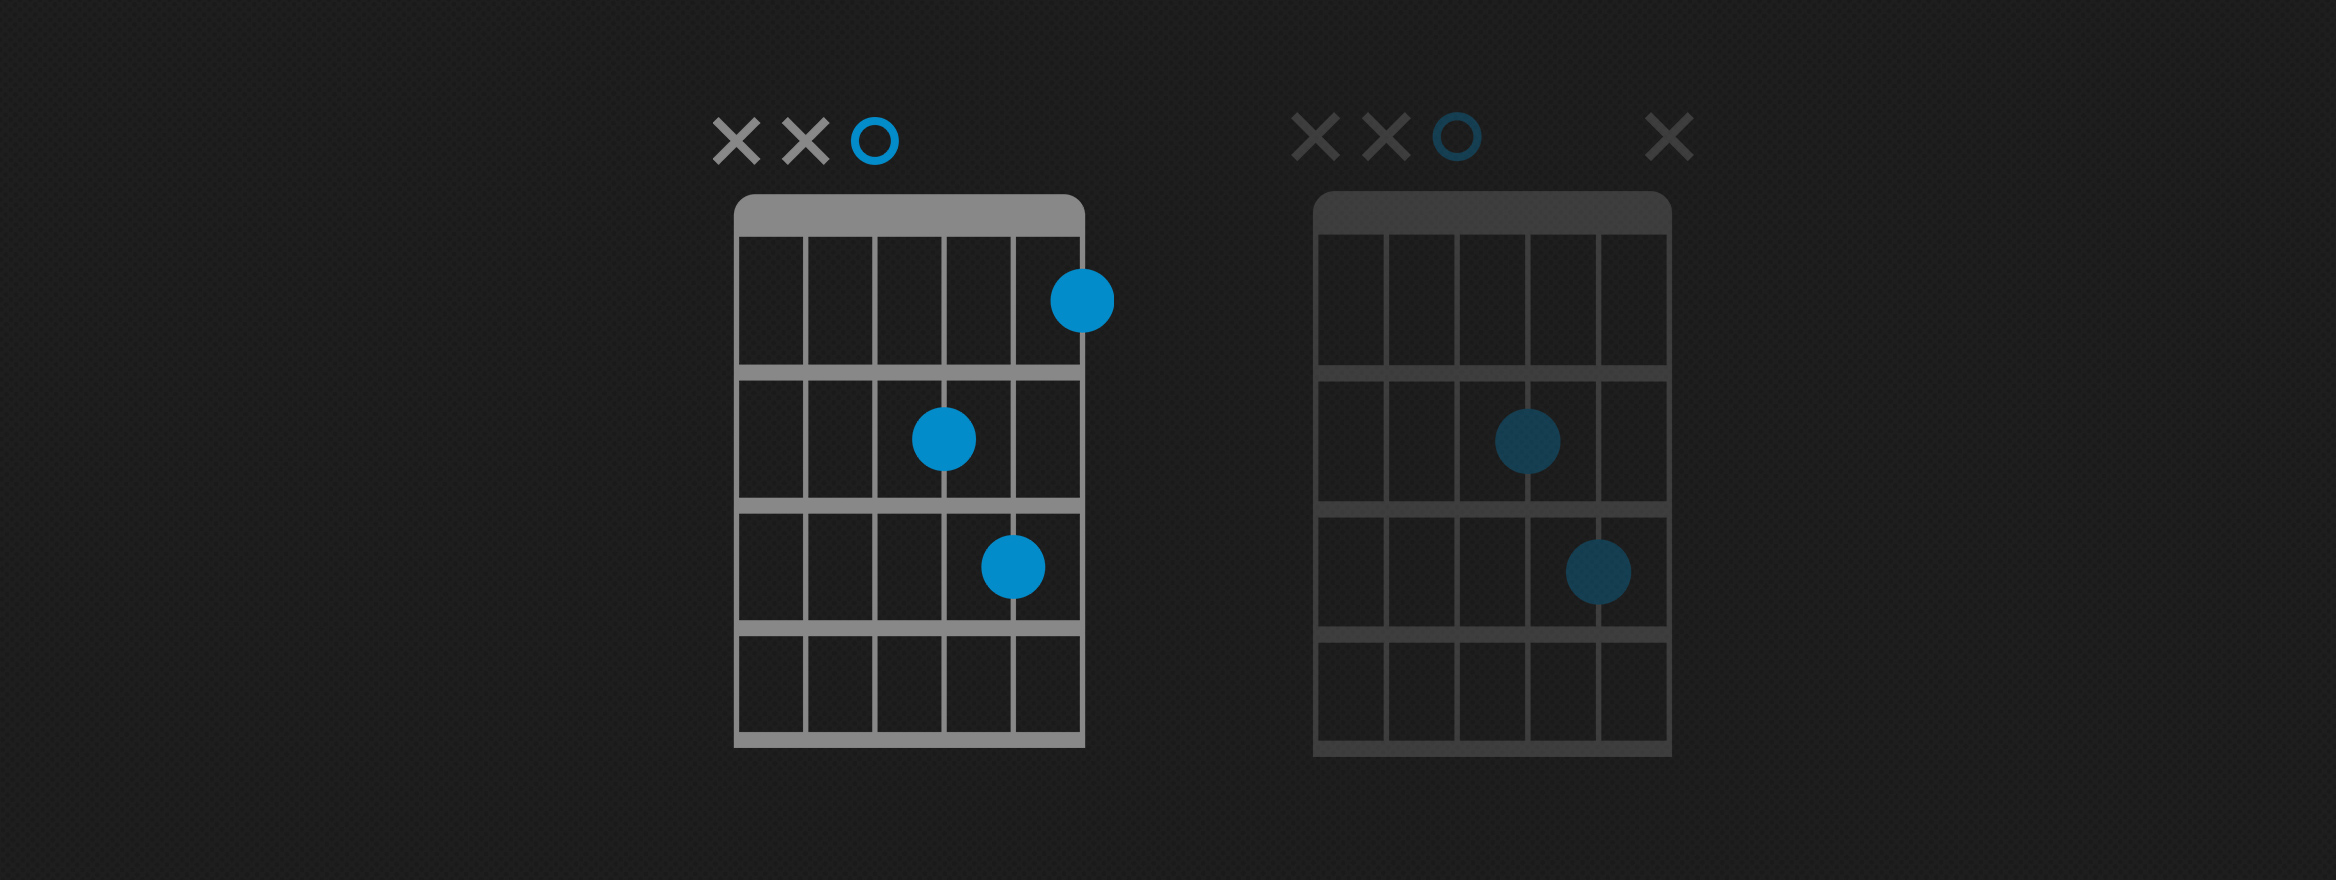 D Minor Chord How To Play Dm Guitar Chord Fender Play